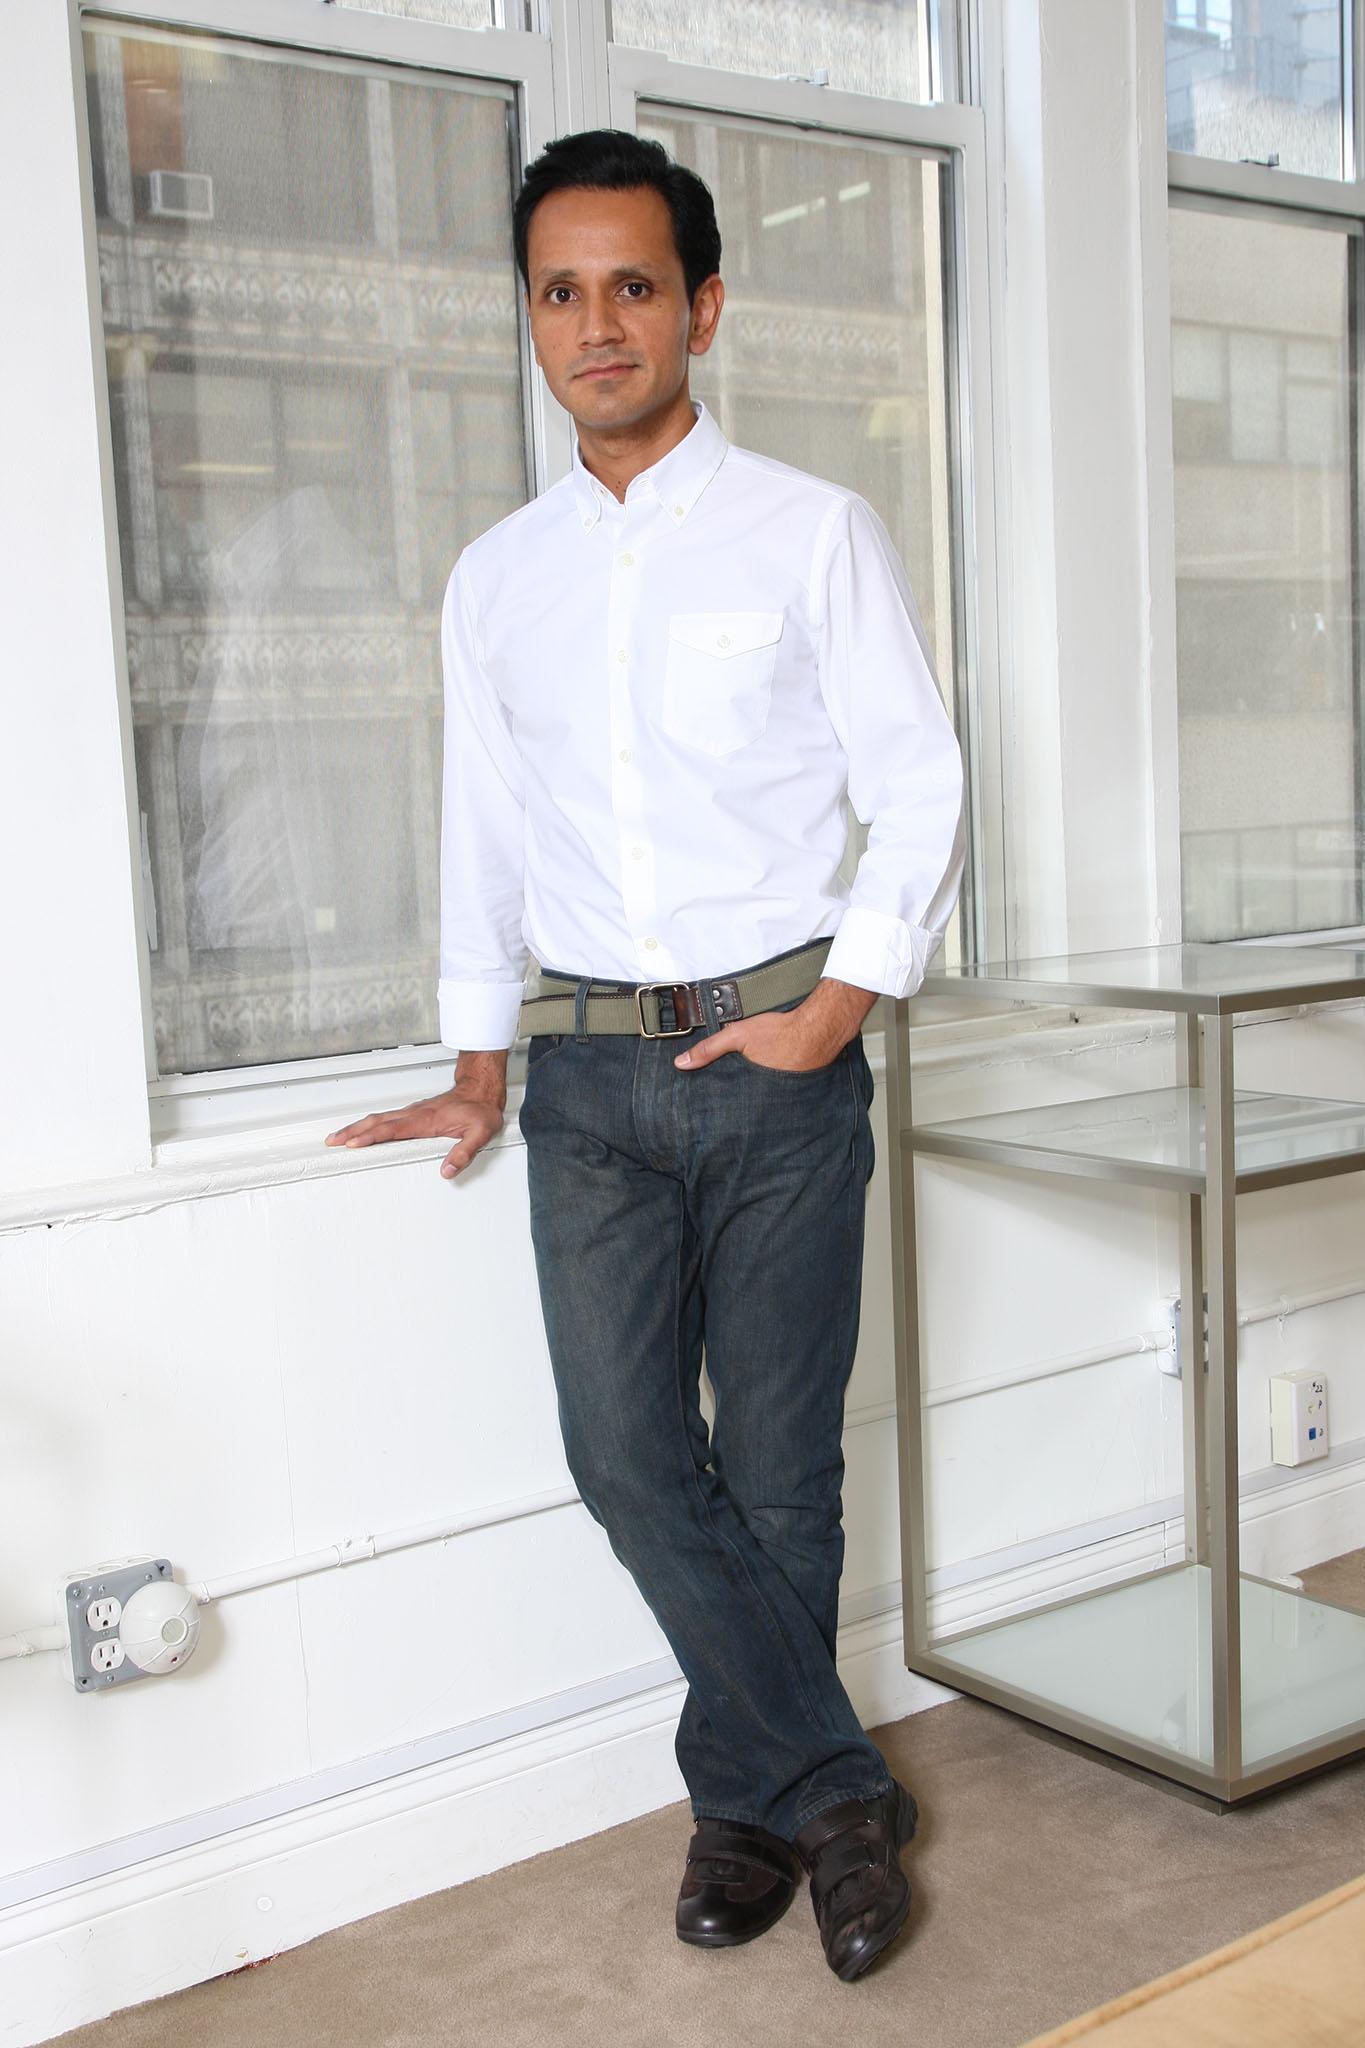 Raul Melgoza